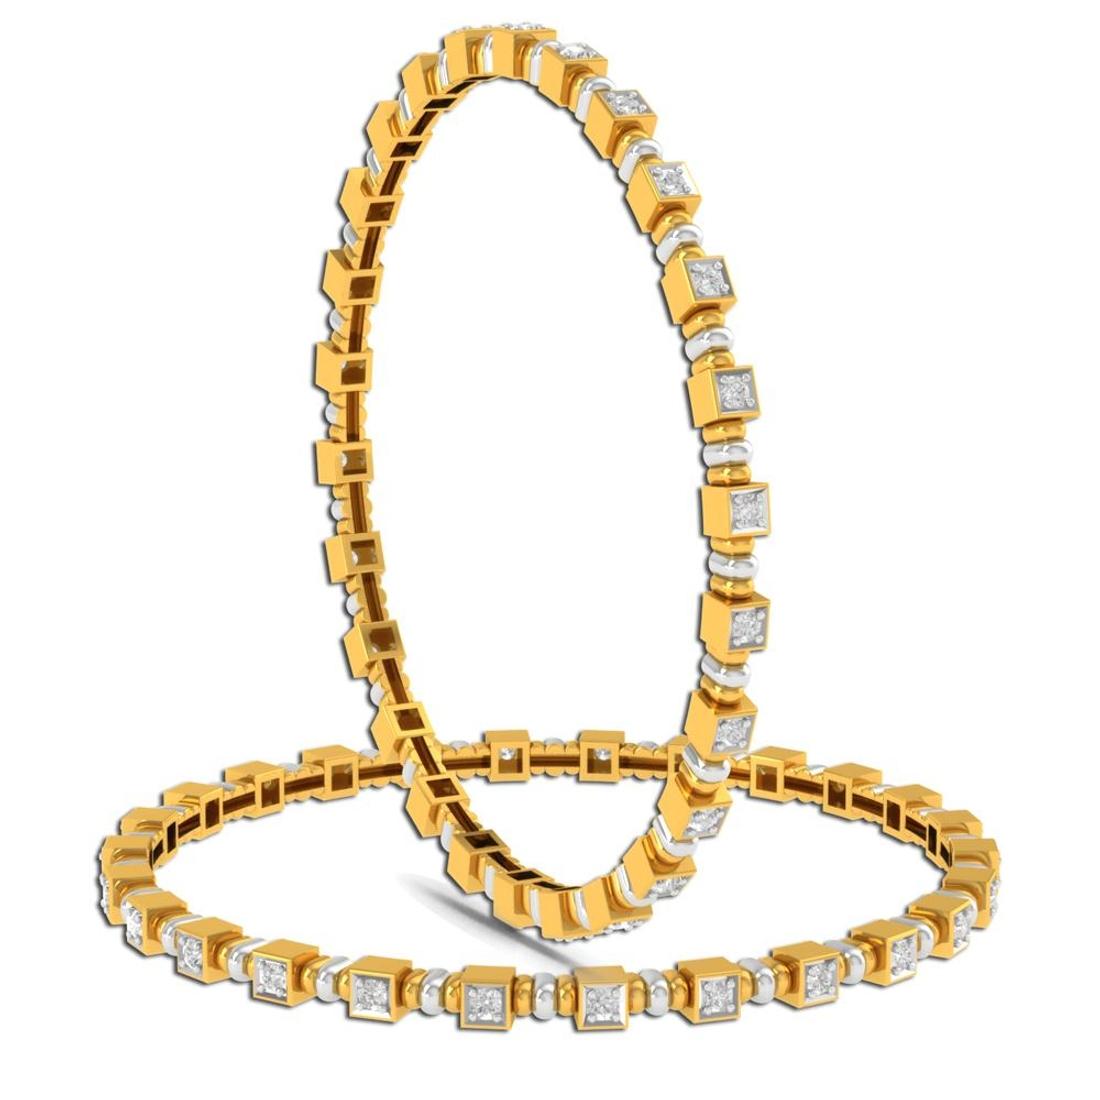 Charu Jewels Diamond Bangle Made with 29.37  Gms 18 KT Yellow Gold Gold And 1.78 Carat Diamonds